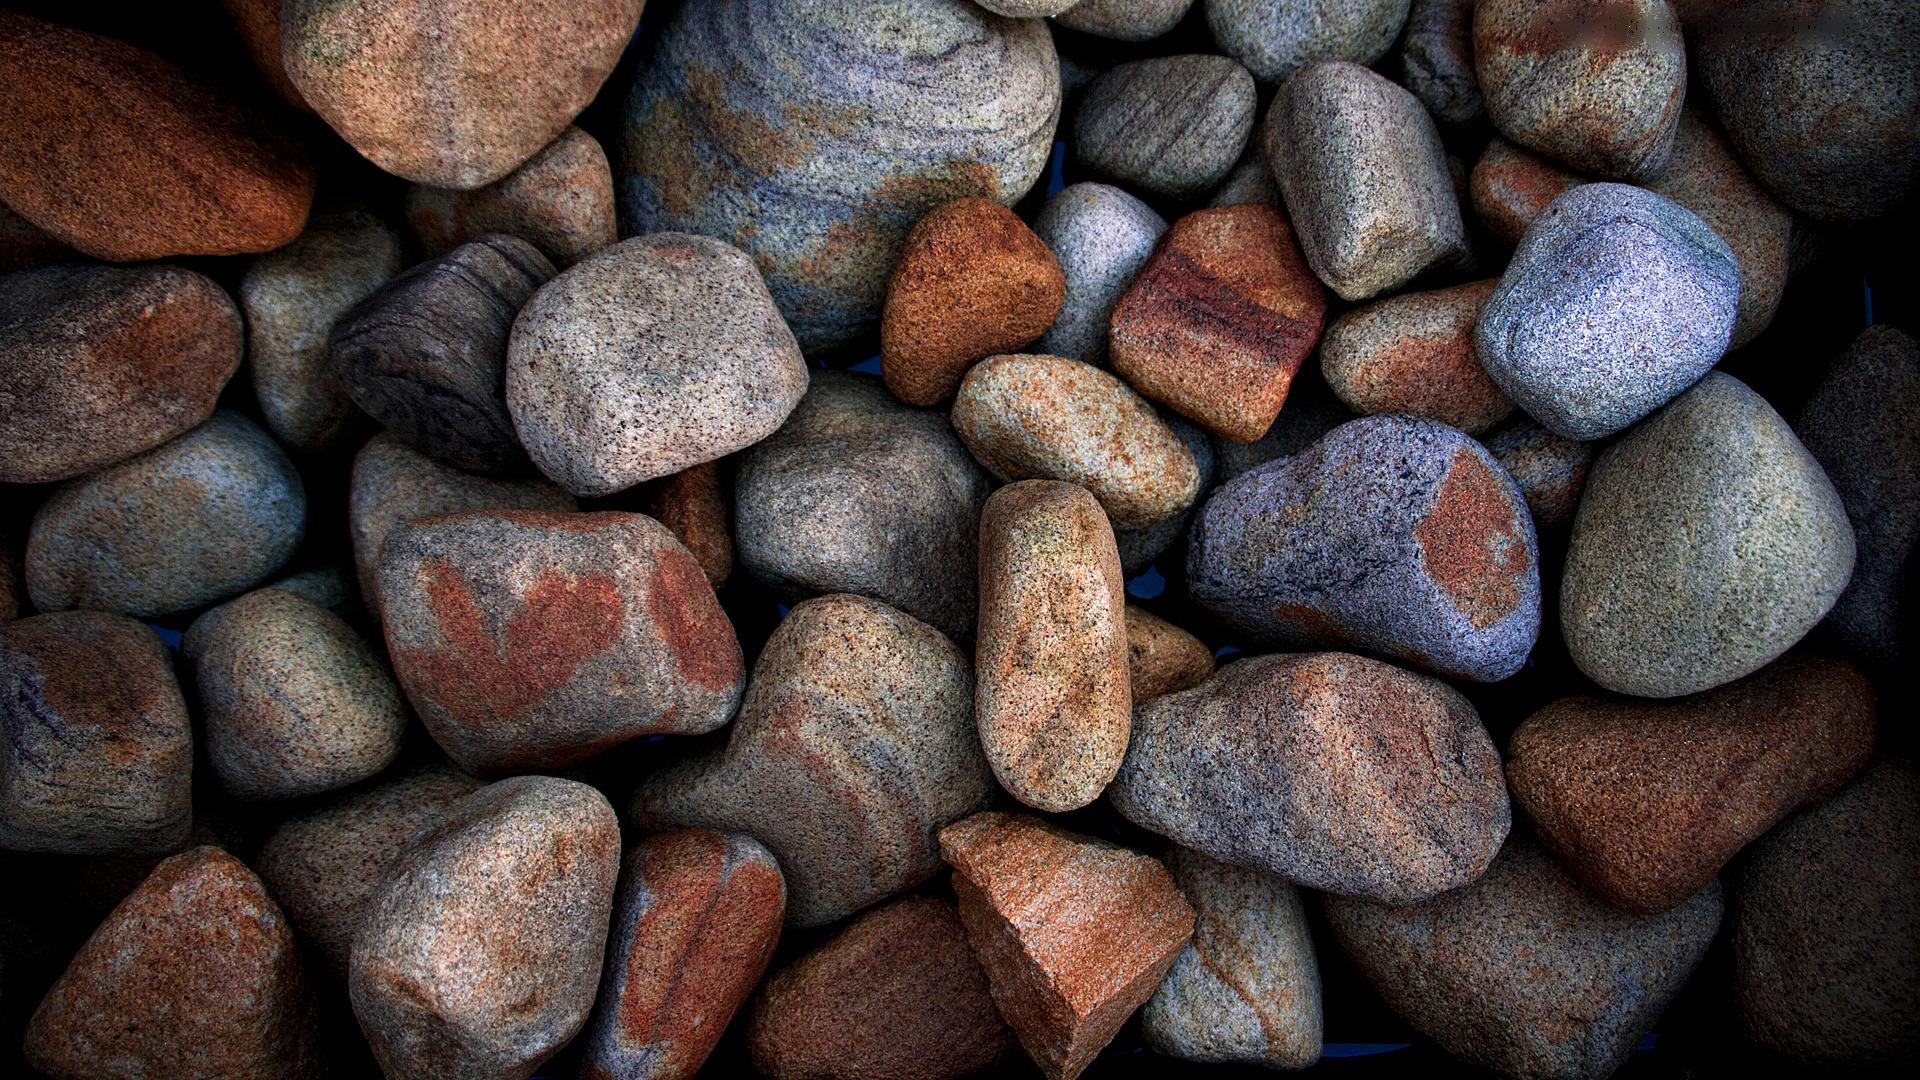 Pictures Full hd wallpapers 1920x1080 macro pebbles rocks stones 1920x1080